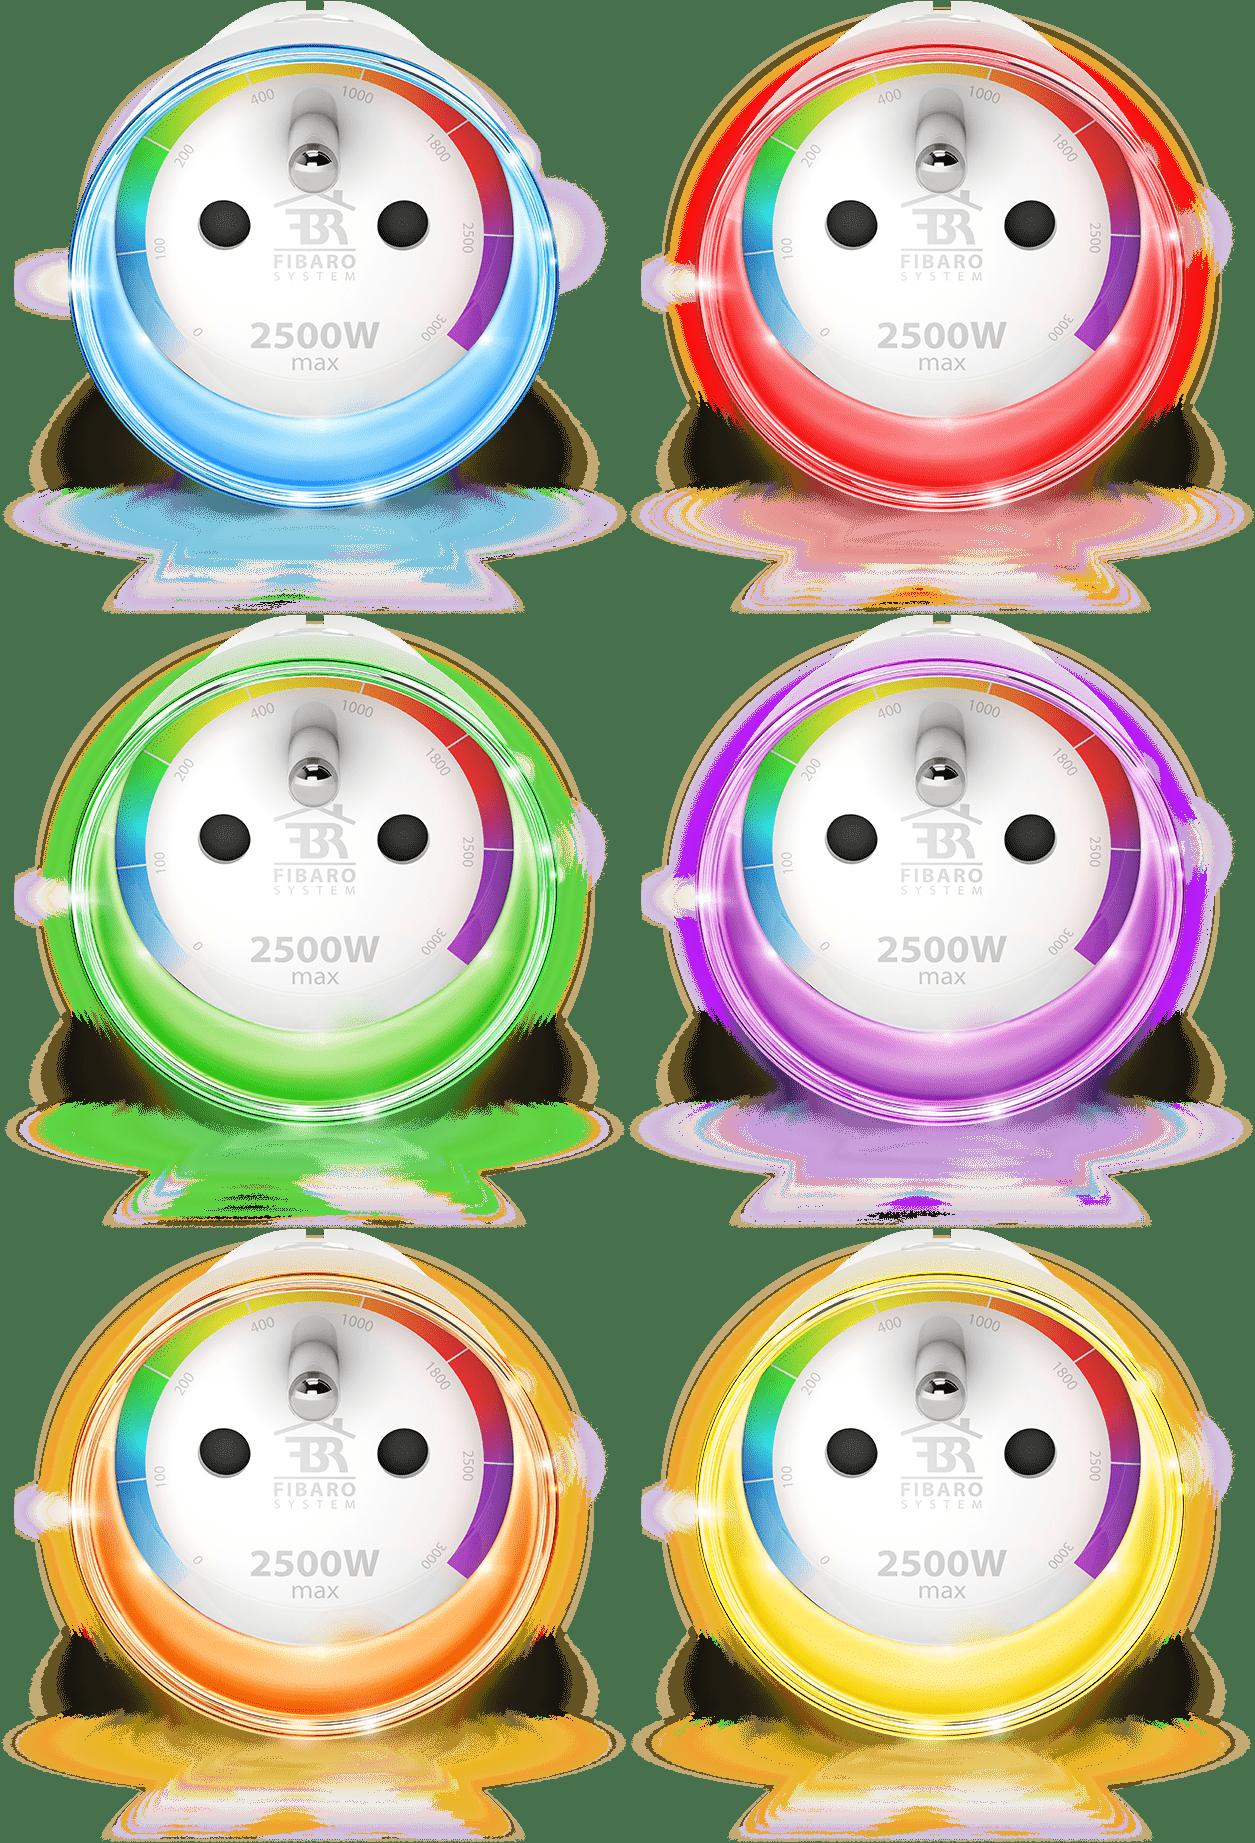 https://www.fibaro.com/pl/wp-content/uploads/sites/5/2017/02/colors.png